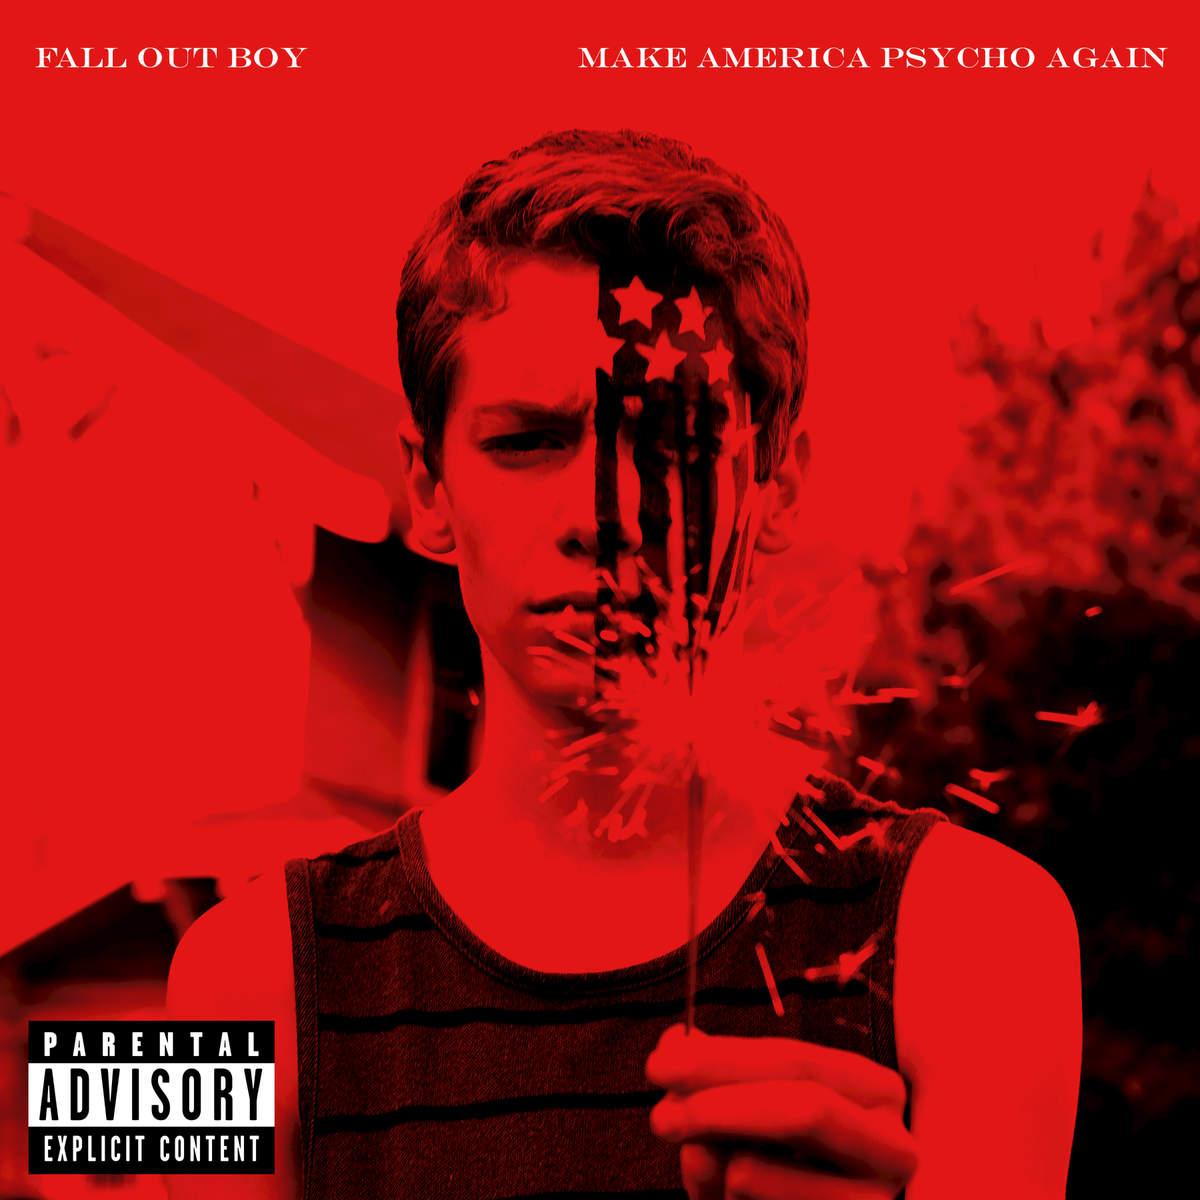 Fall-Out-Boy-Make-America-Psycho-Again-2015-1200x1200